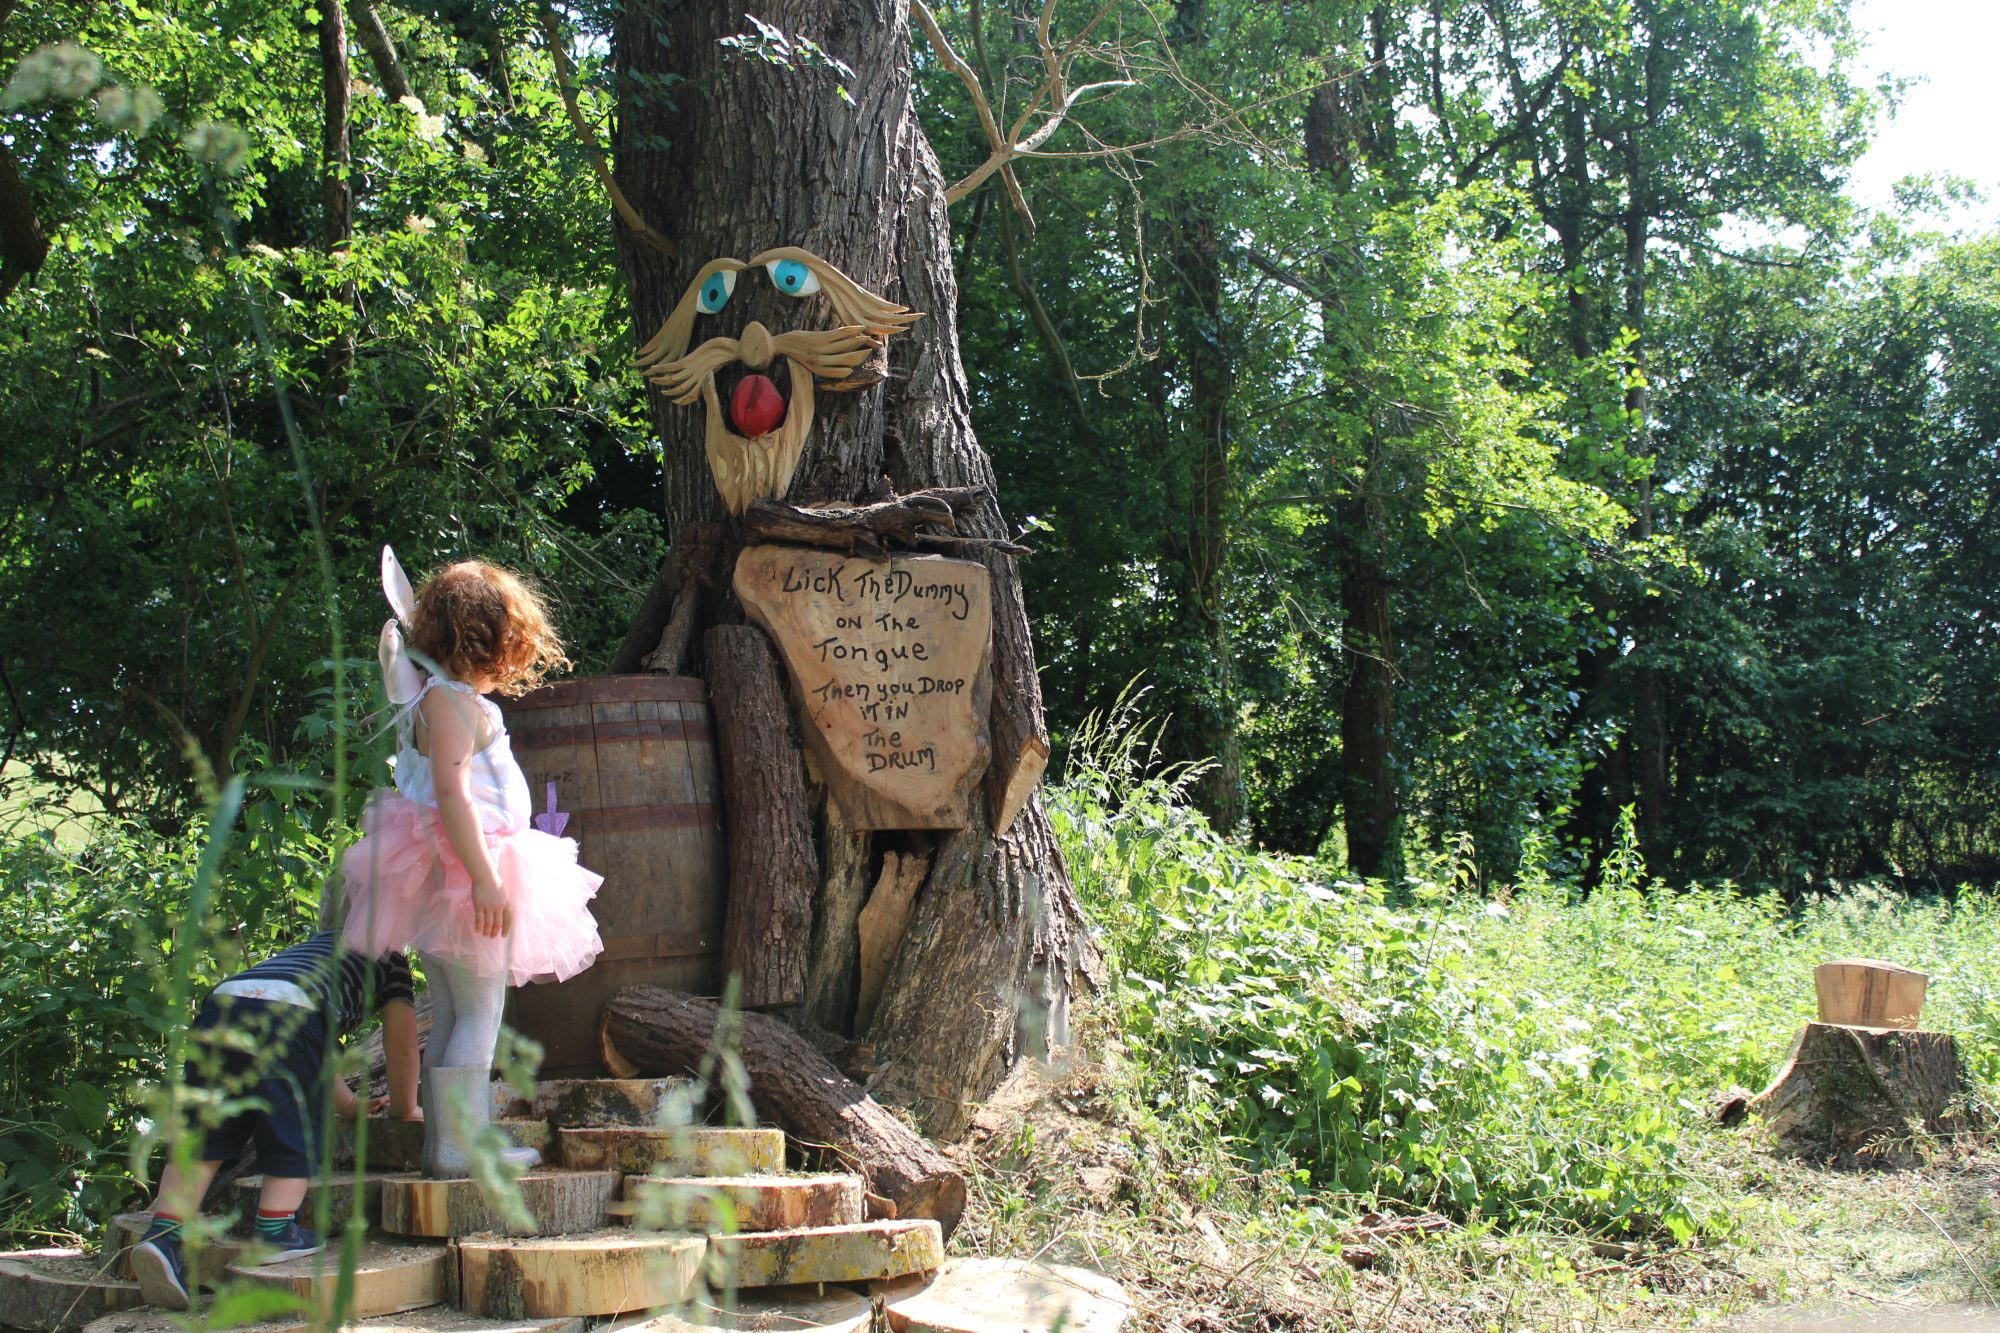 churchfields-fairy-trail-hero